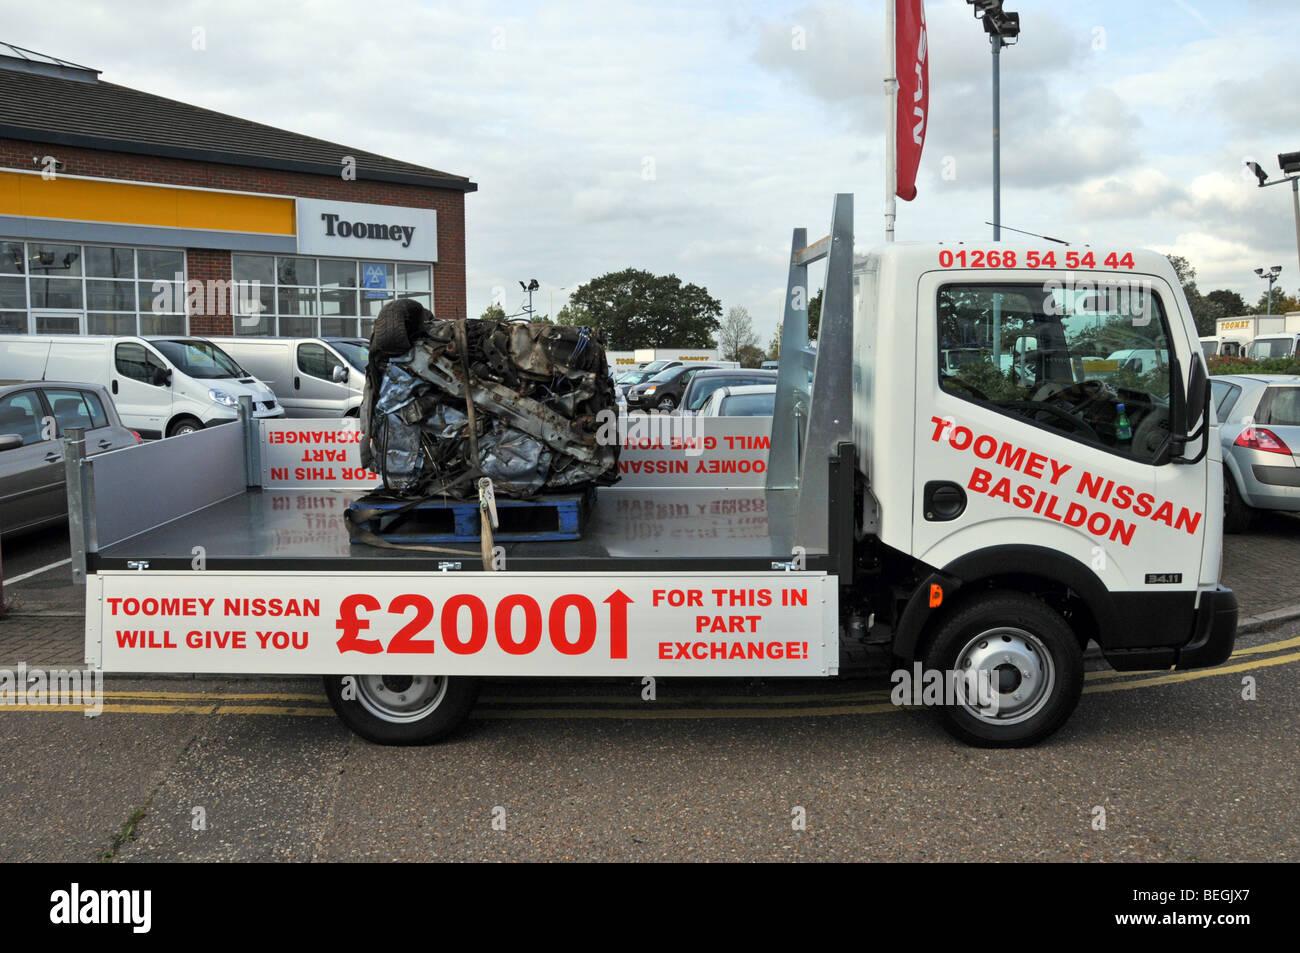 Car Scrap Scheme Stock Photos & Car Scrap Scheme Stock Images - Alamy